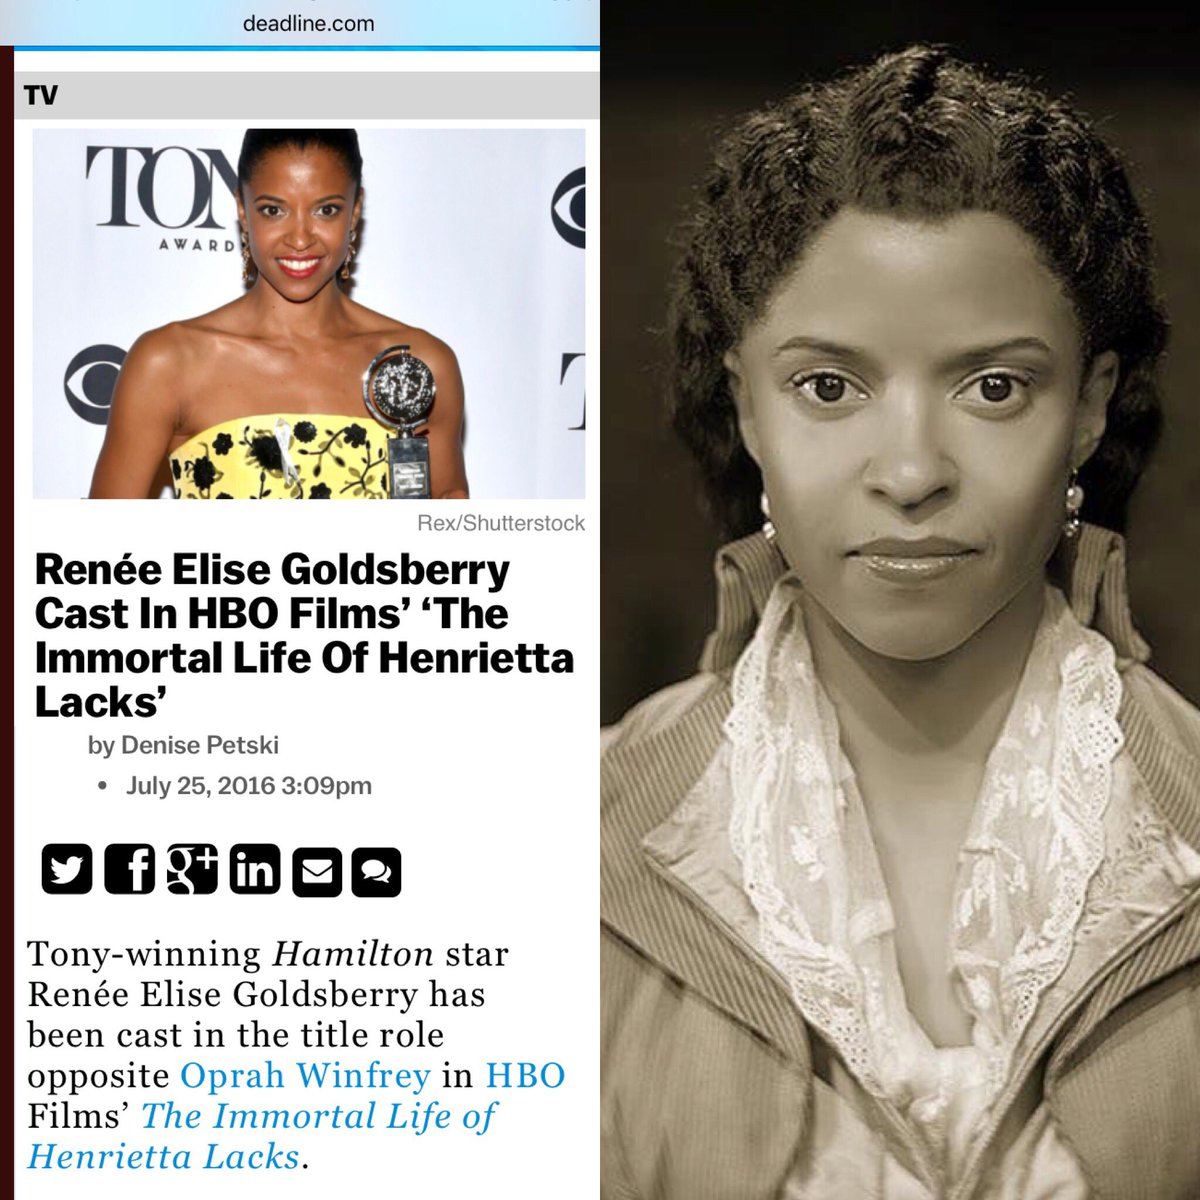 ICYMI @reneeelisegolds to play #HenriettaLacks in #HeLaFilm adaptation with @Oprah as Deborah & #RoseByrne as me! https://t.co/GMPTNswTCT